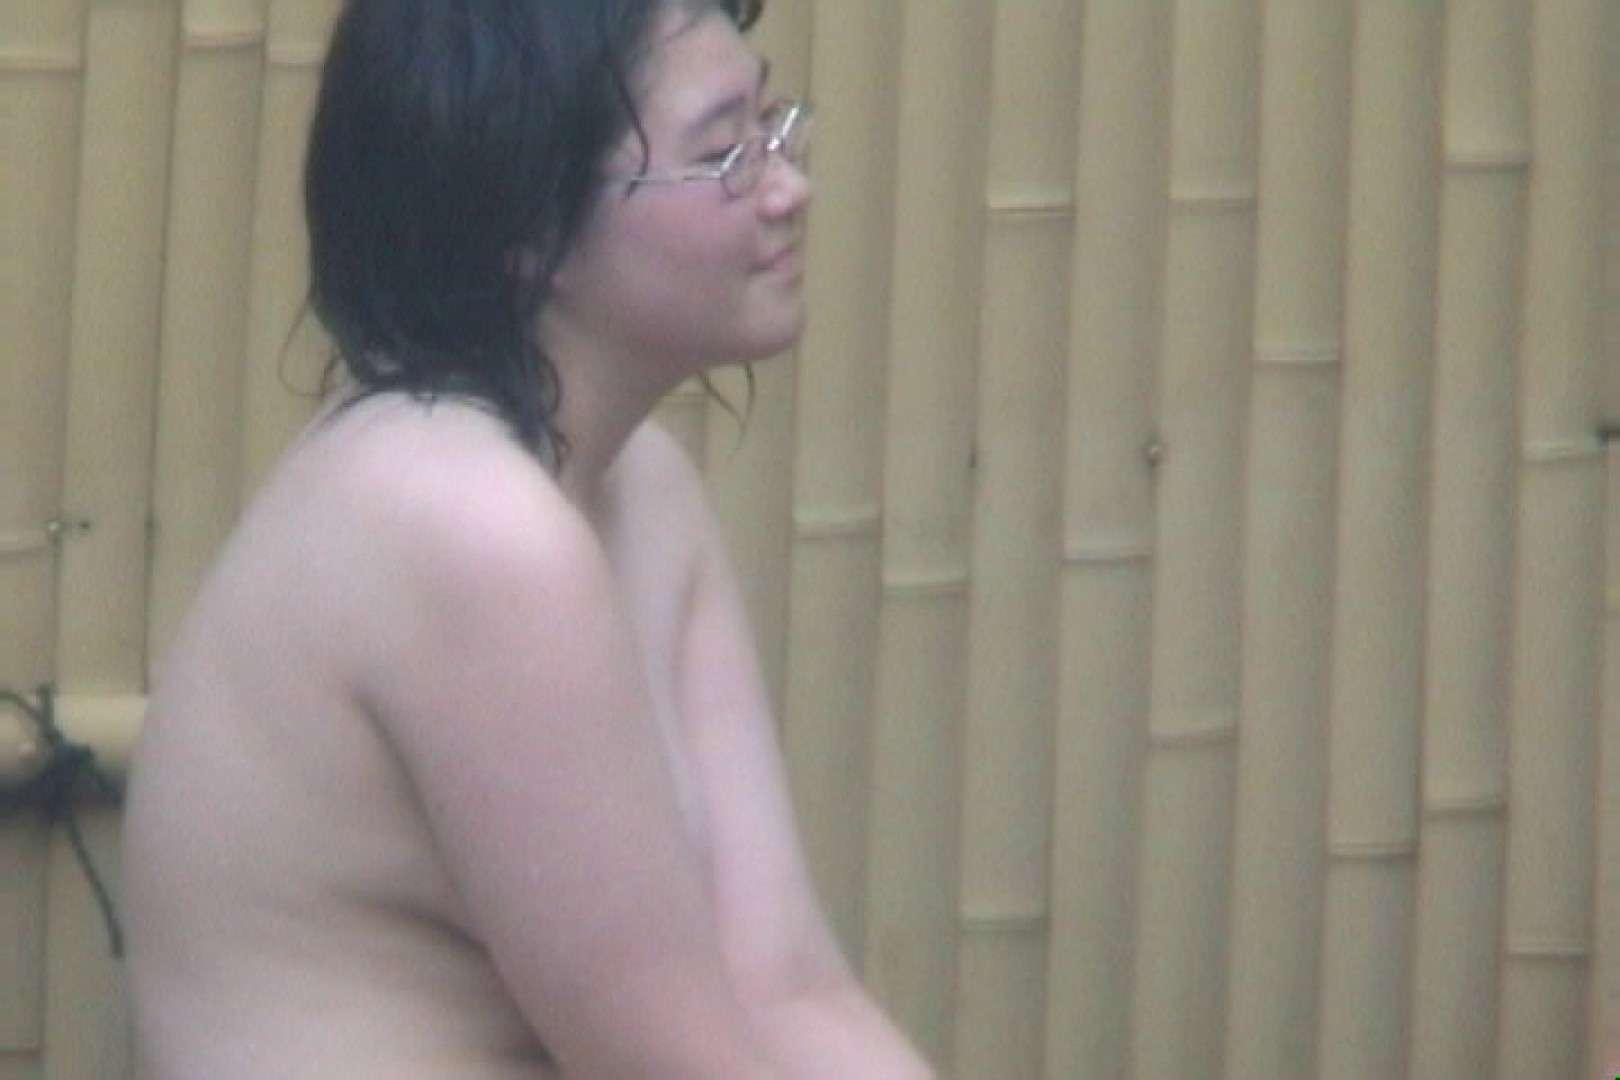 Aquaな露天風呂Vol.46【VIP限定】 女体盗撮 | 露天  98連発 4